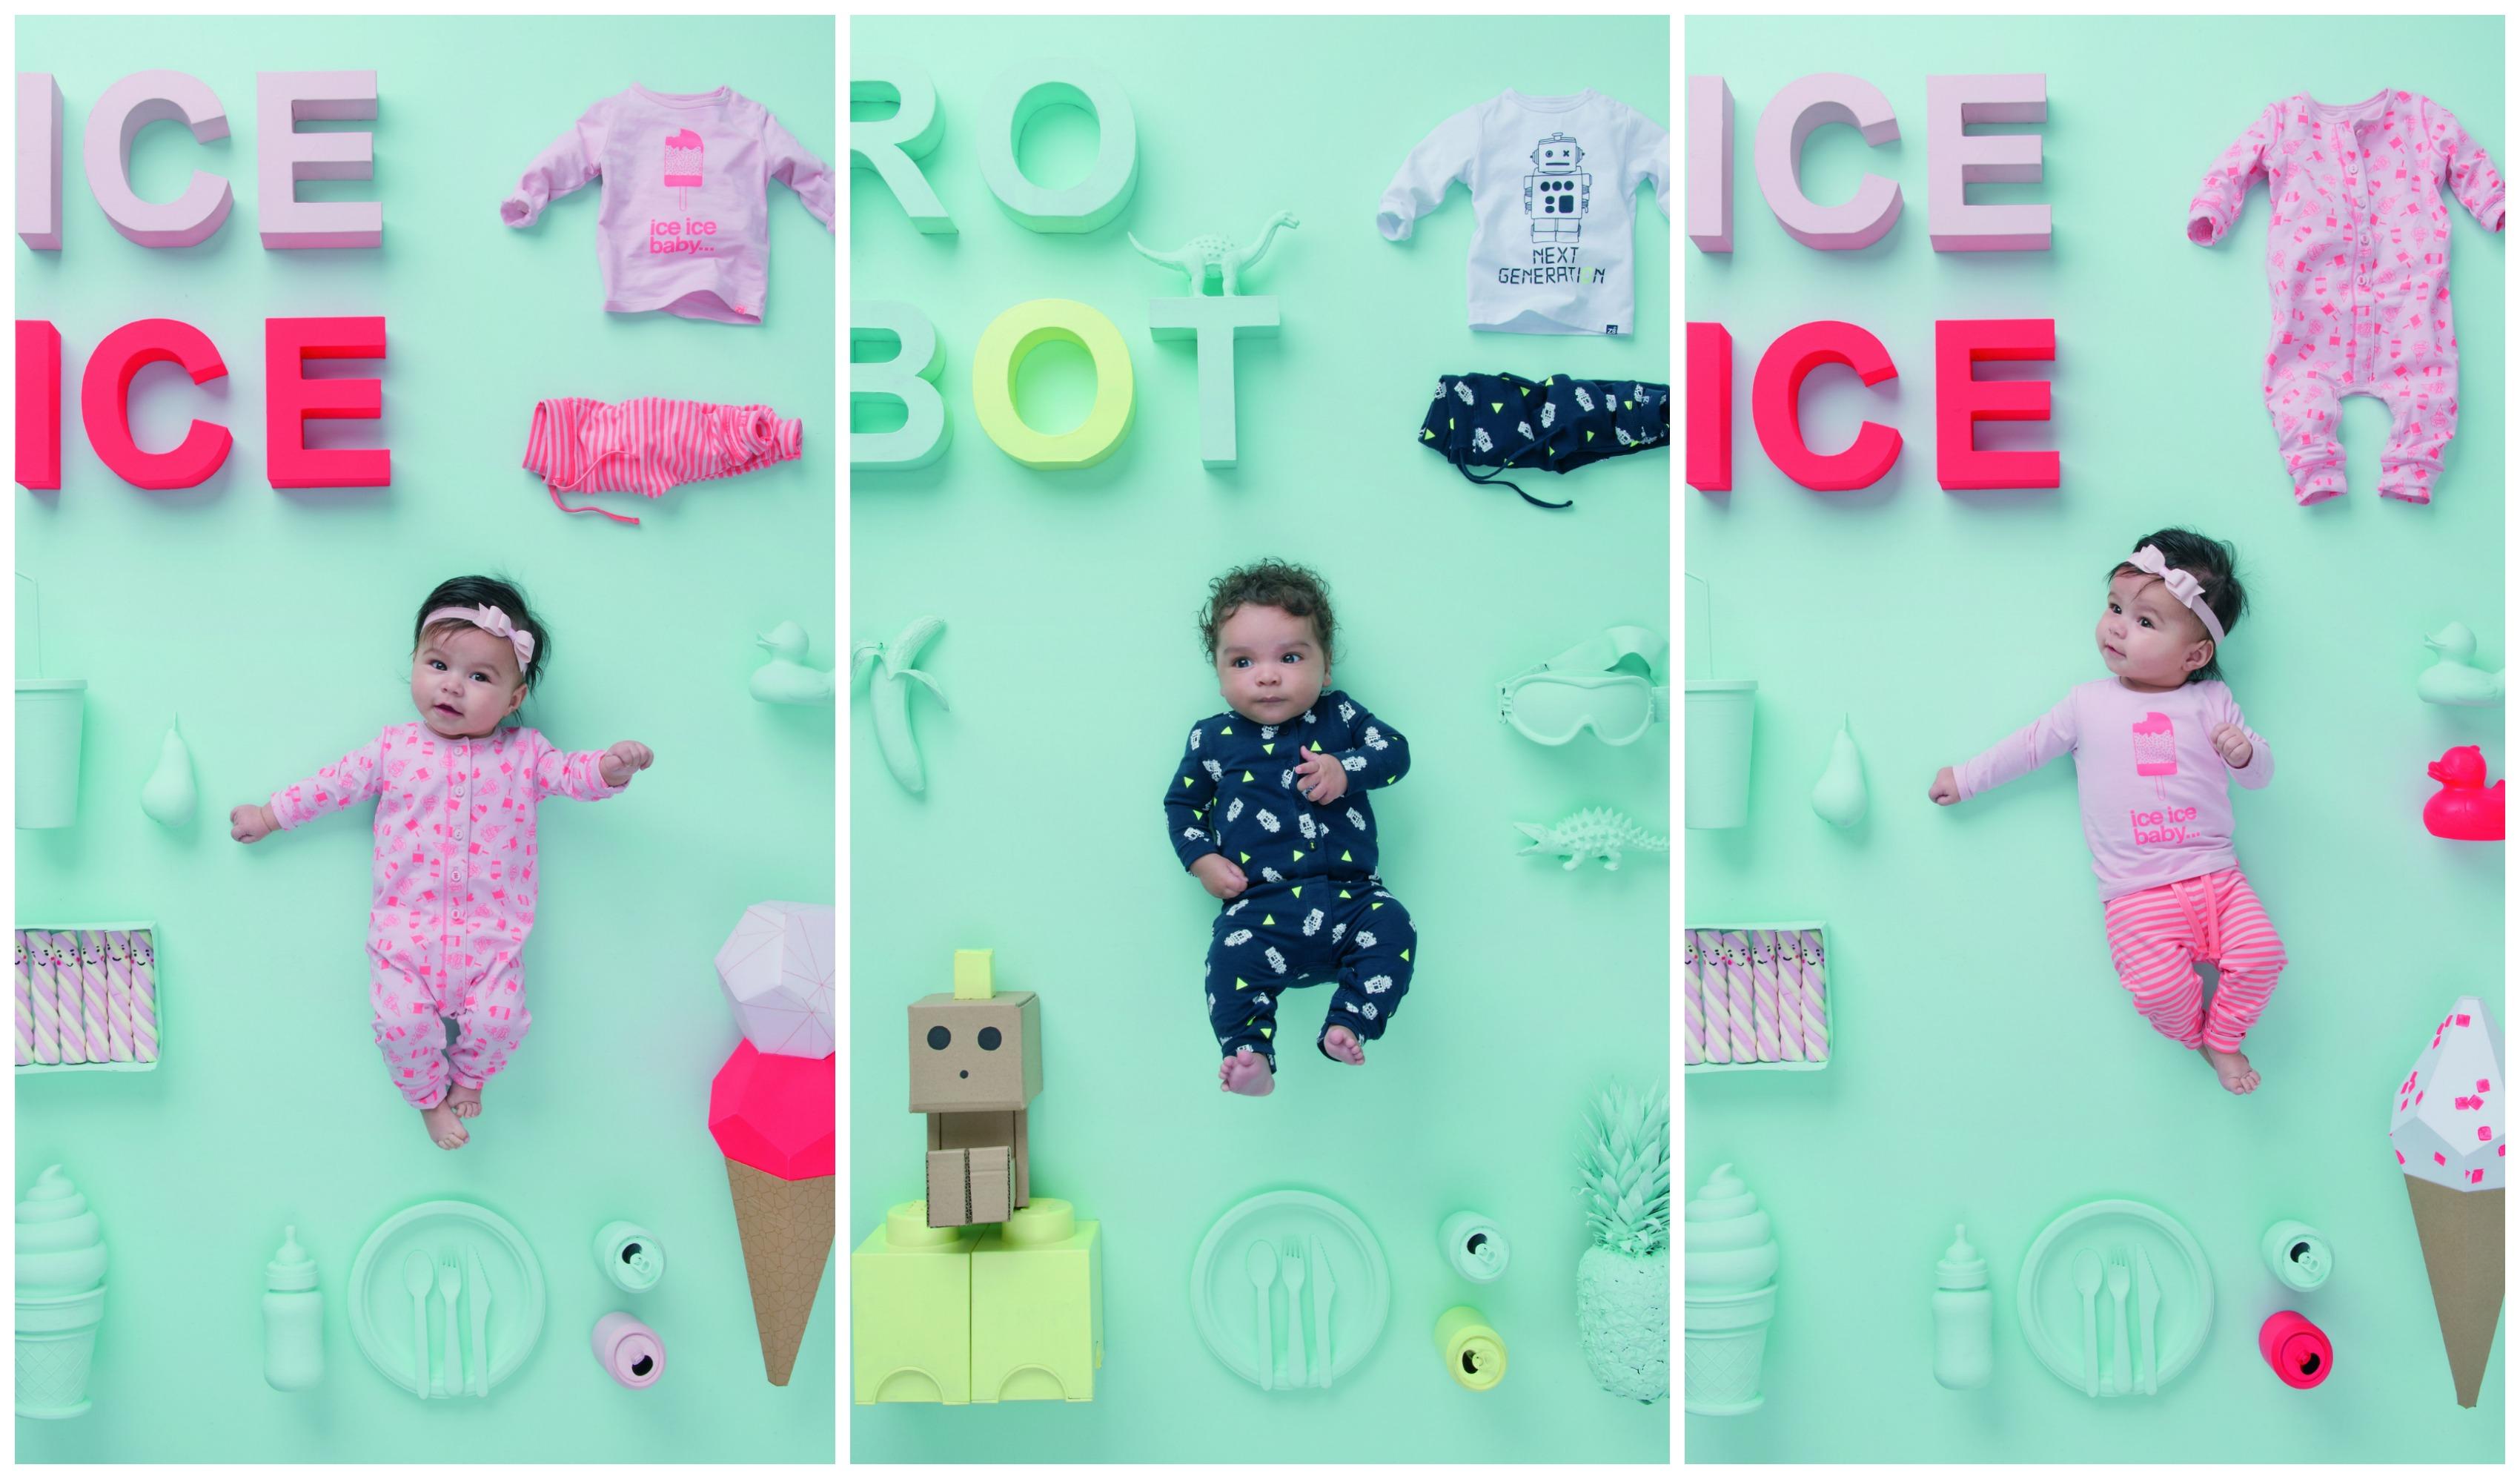 Z8 Newborn Limited Edition Ice Ice Baby-GoodGirlsCompany